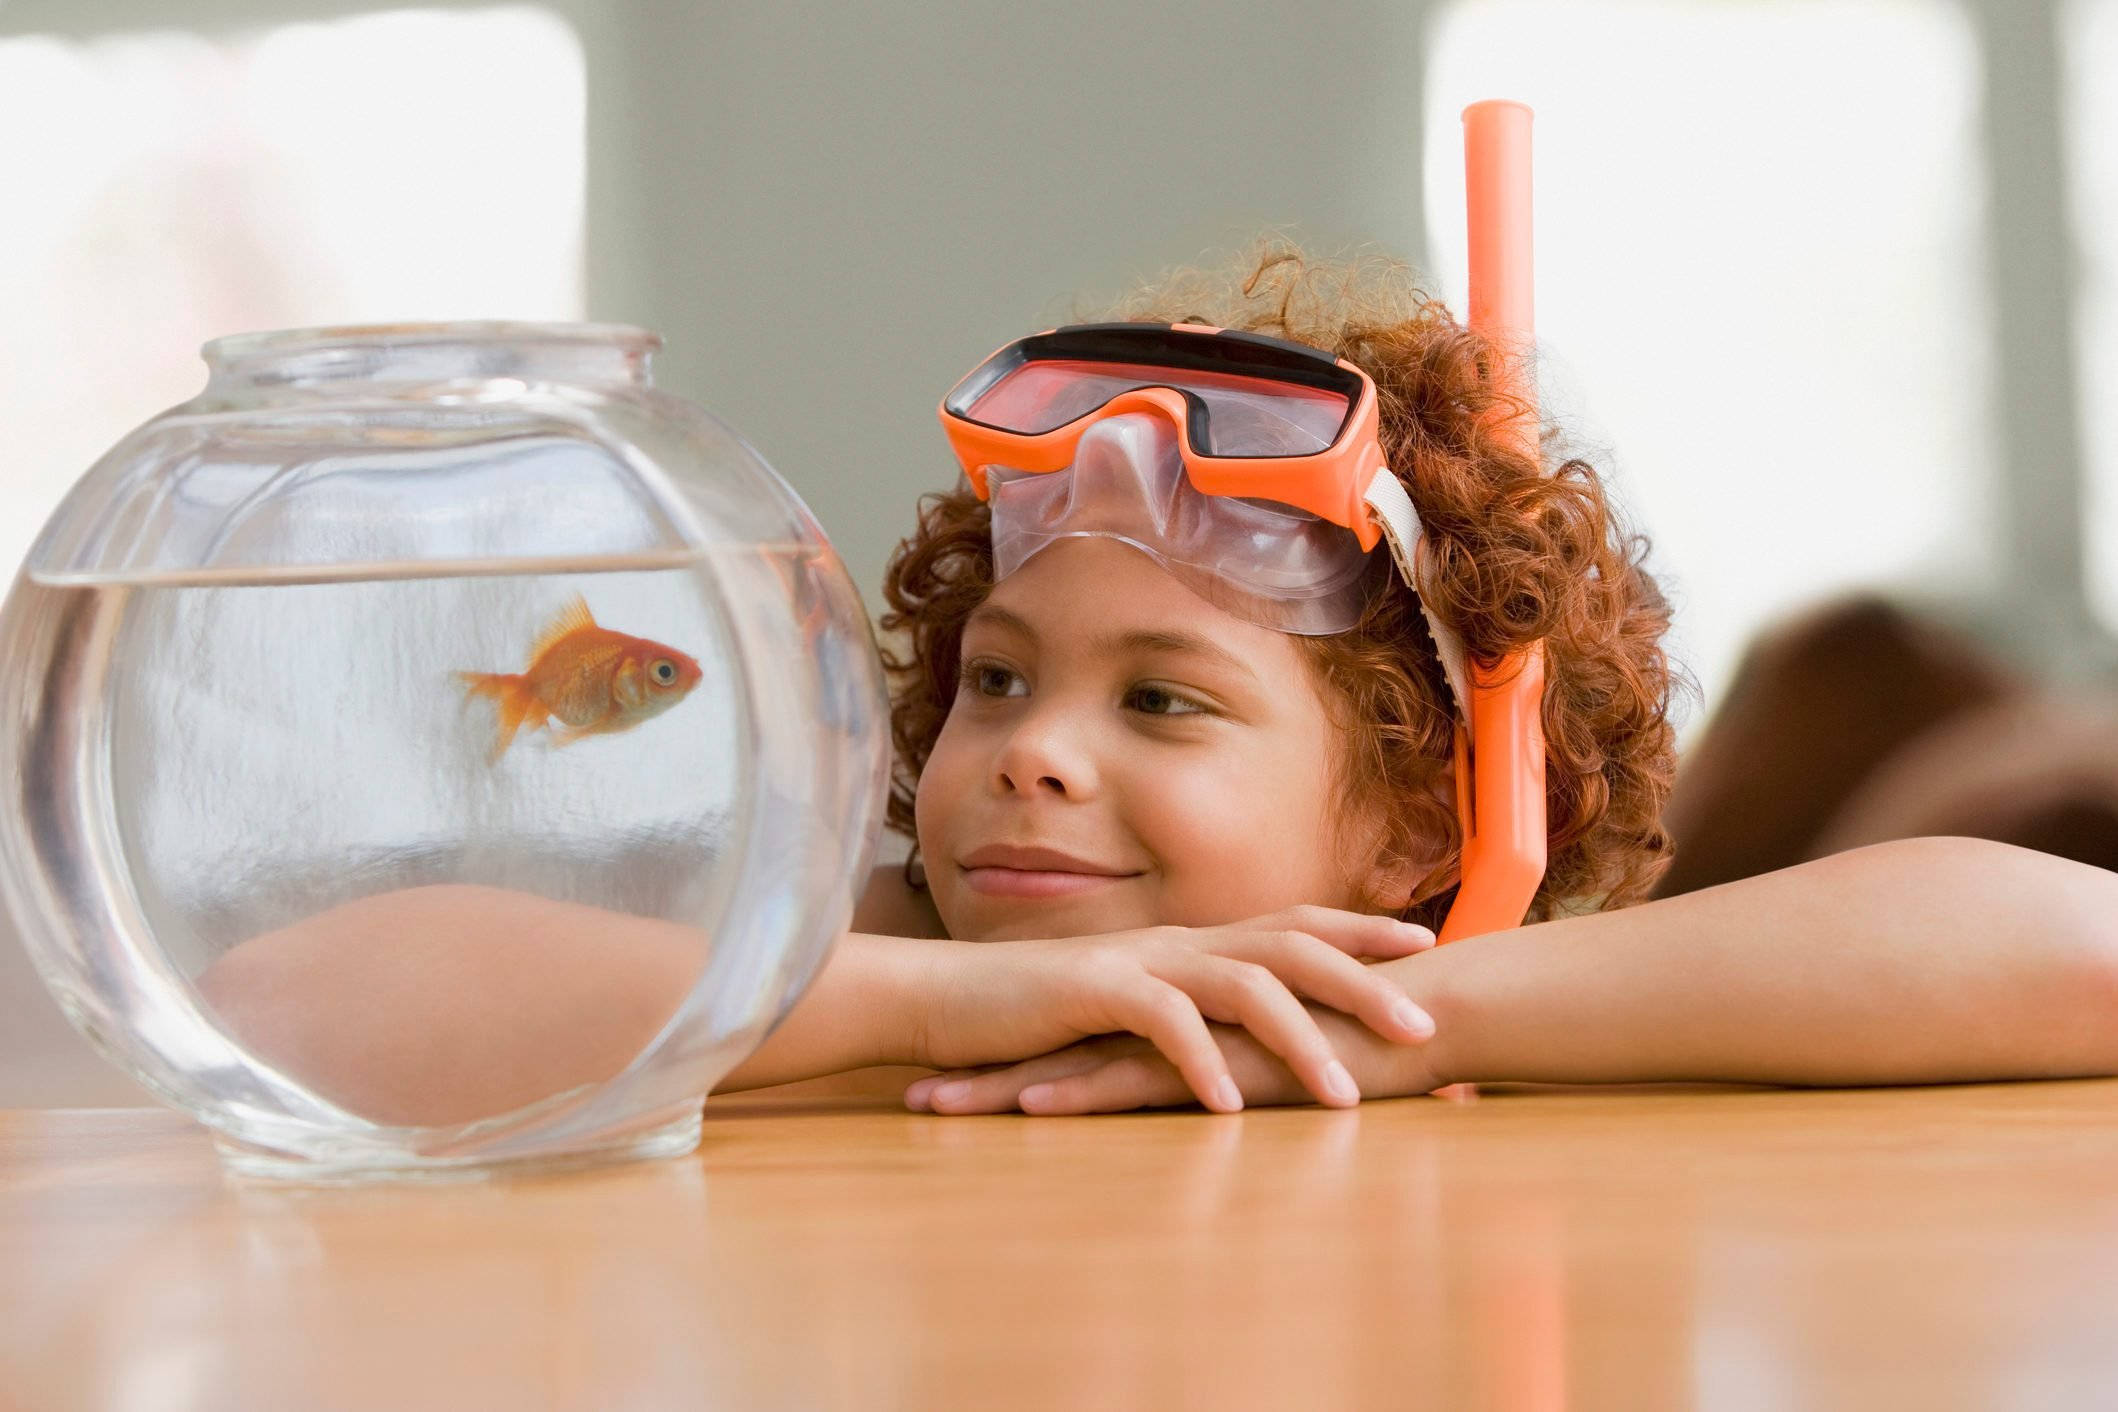 Mixed Race boy looking at fish in bowl